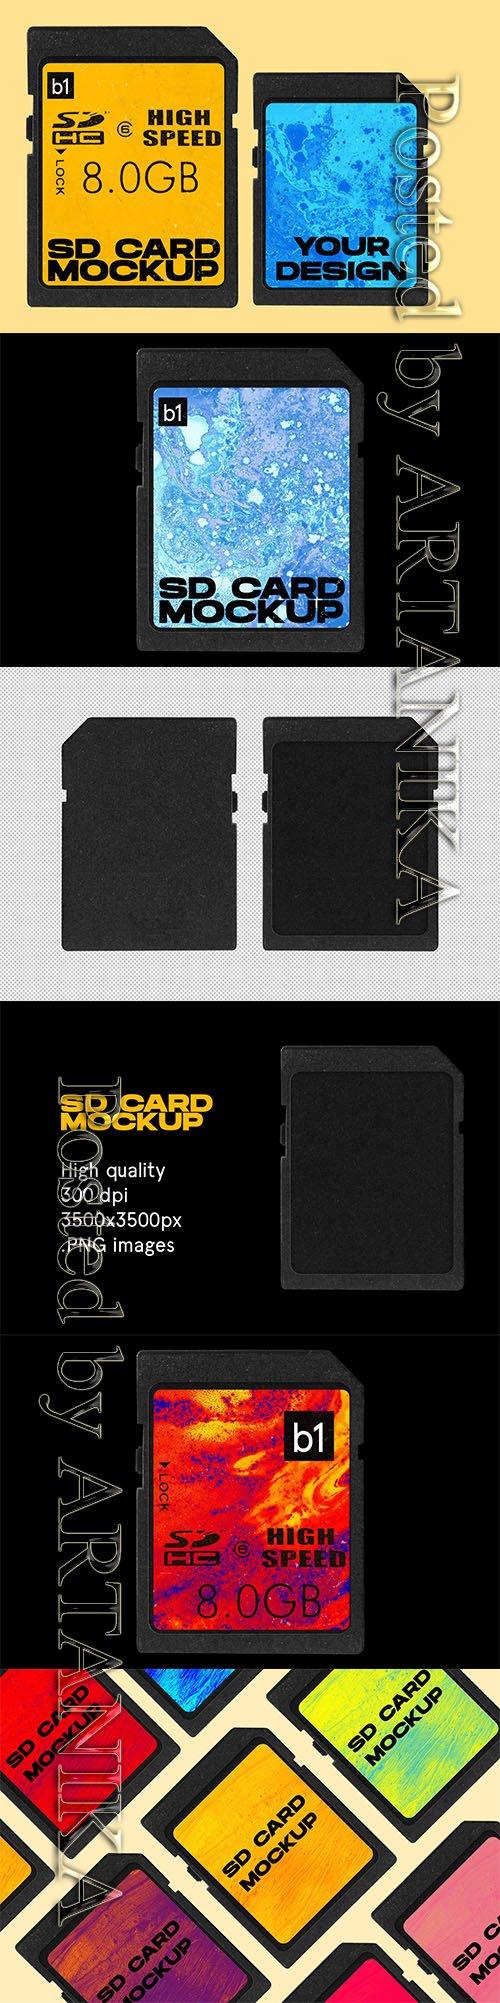 SD Memory Card Mockup